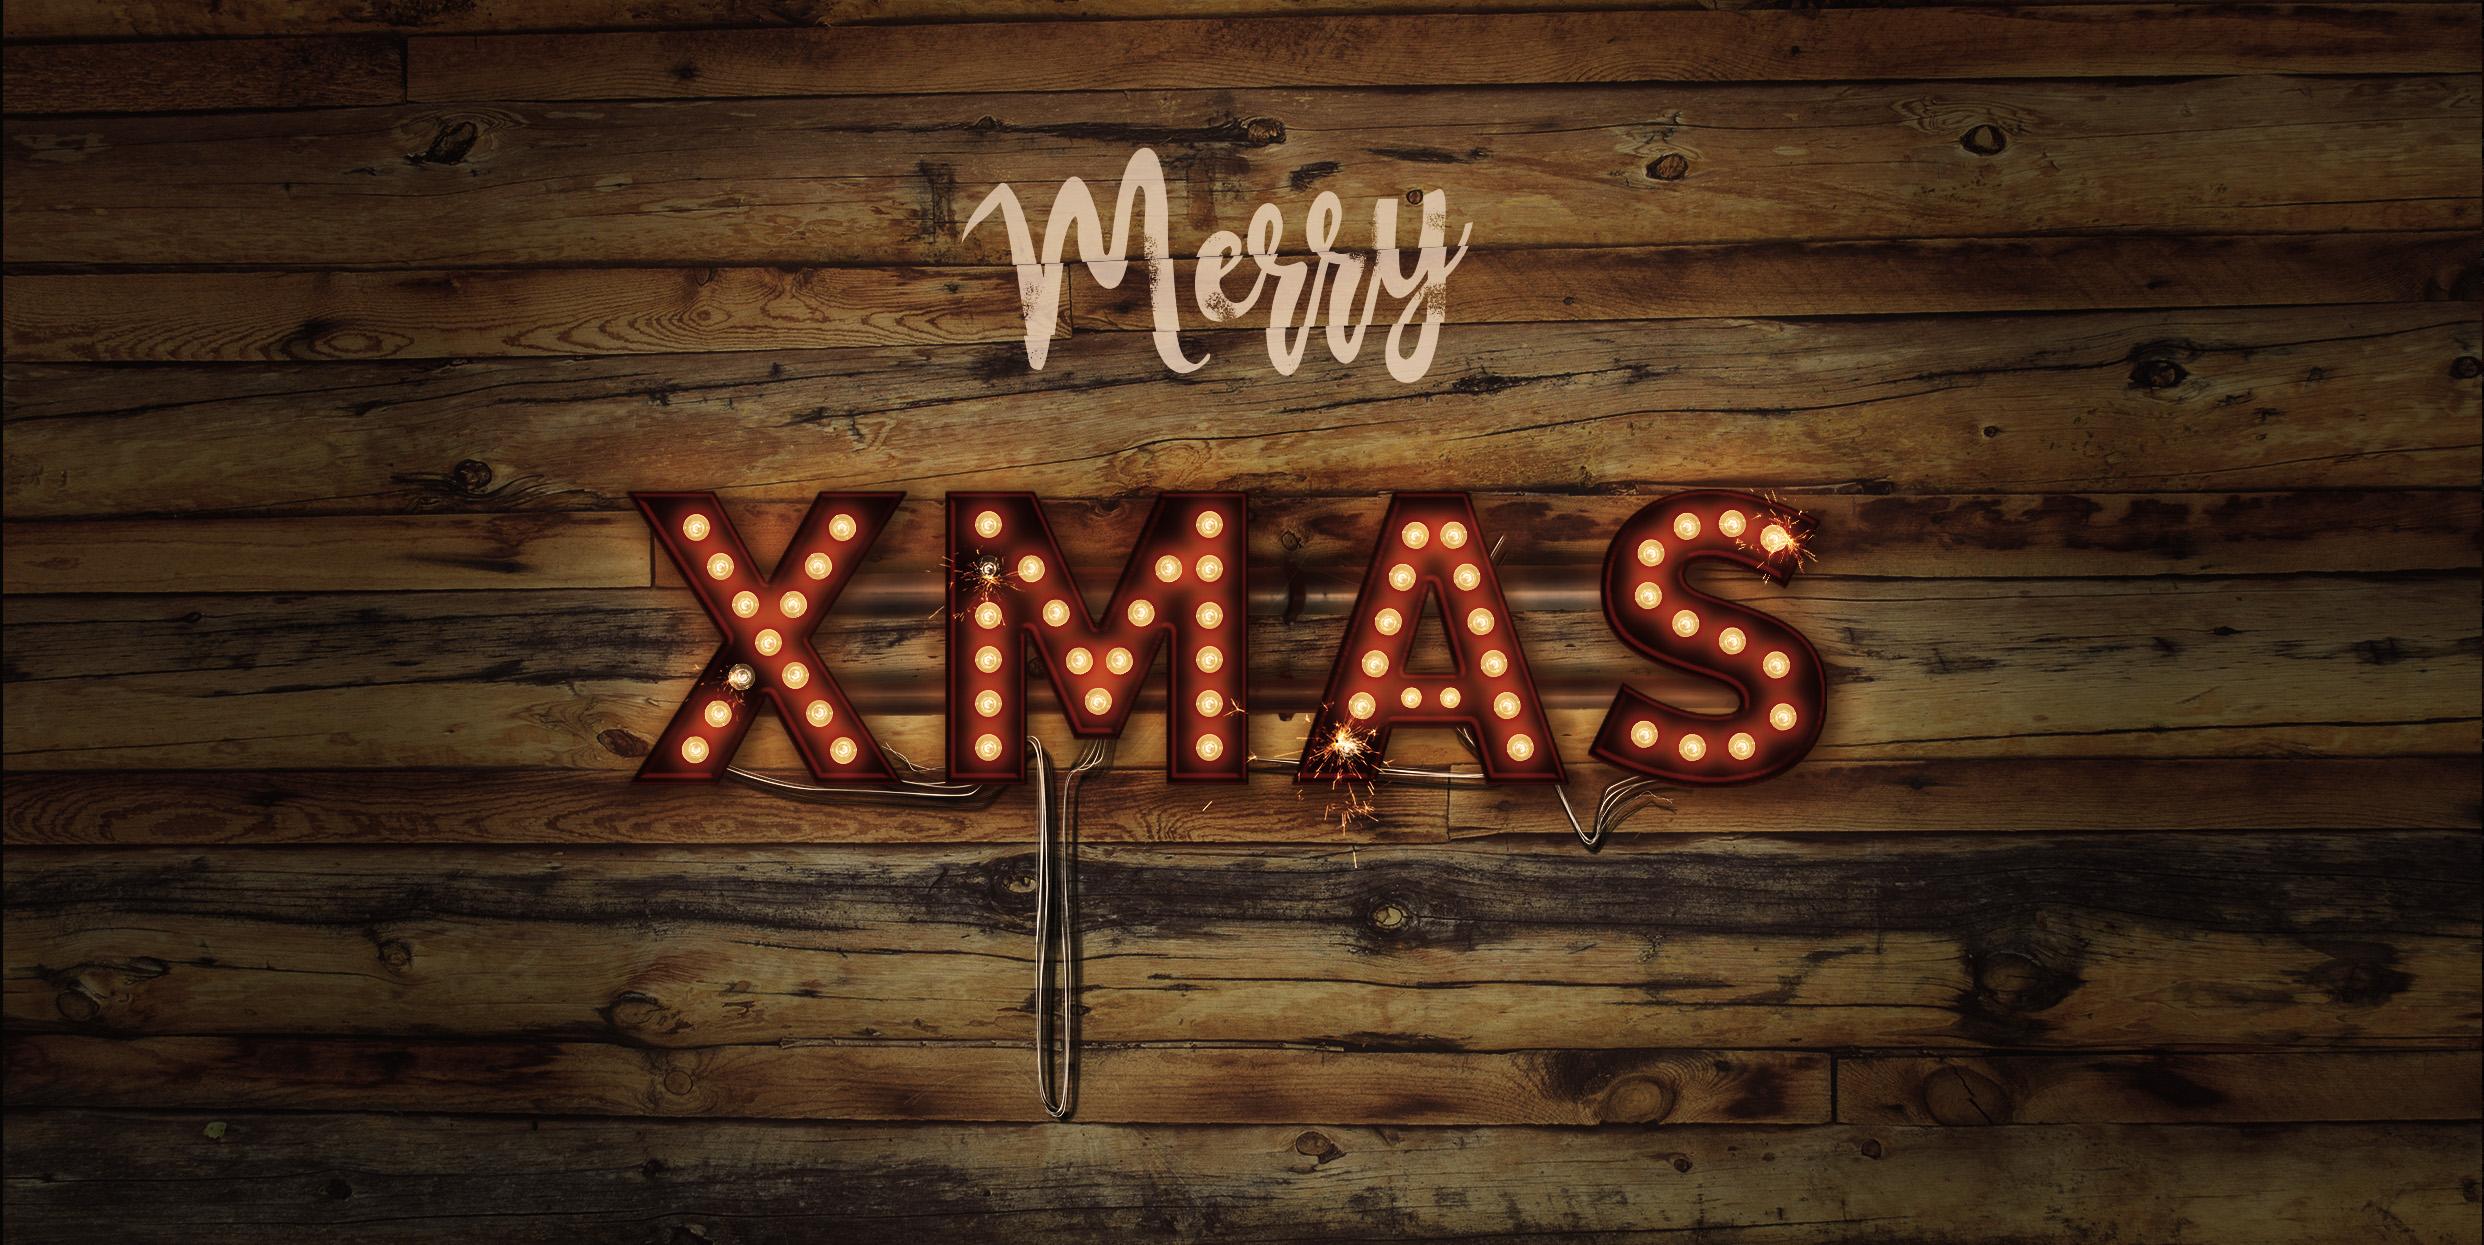 Lightbulb Merry Christmas Signs | 14-Image Bundle example image 8